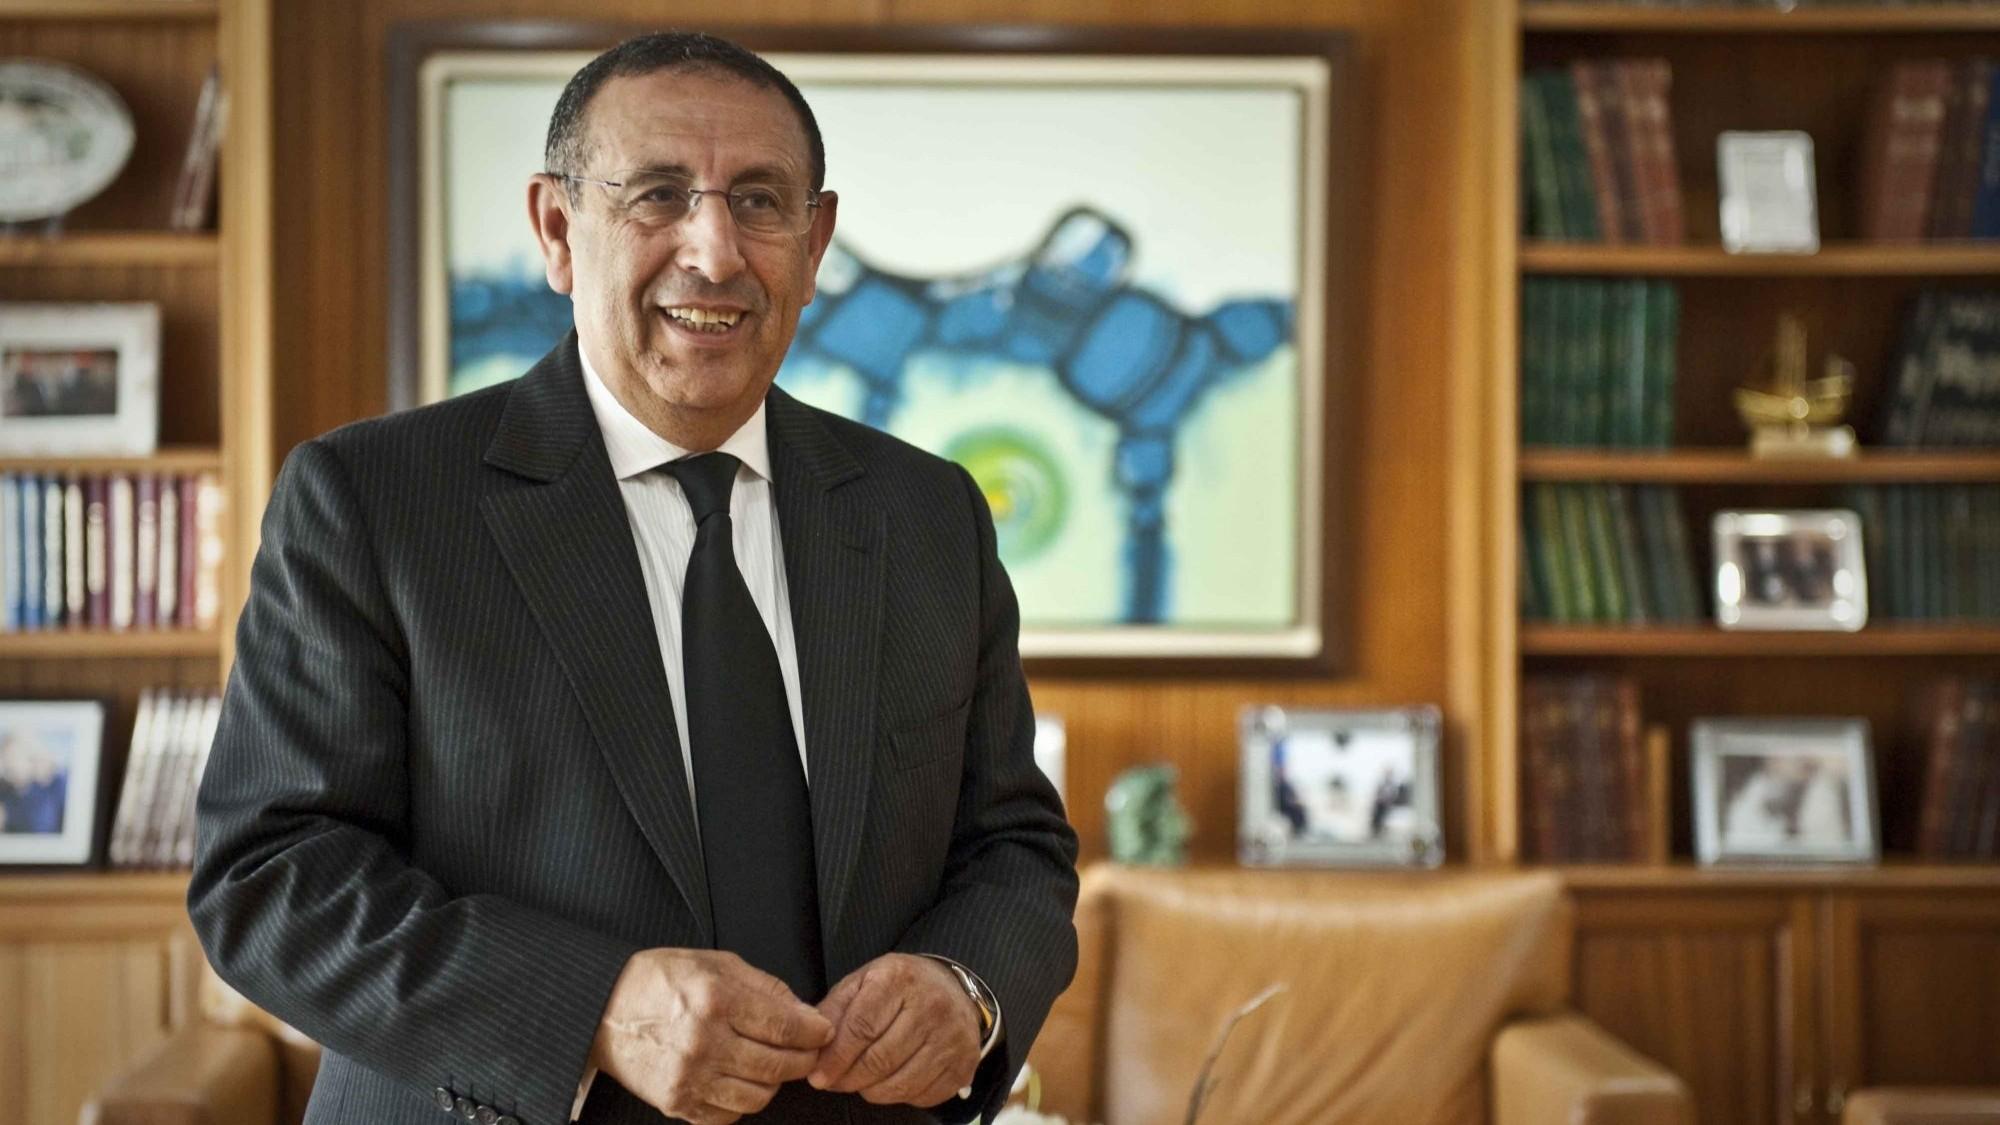 Sahara Marocain : Youssef Amrani déconstruit les thèses séparatistes